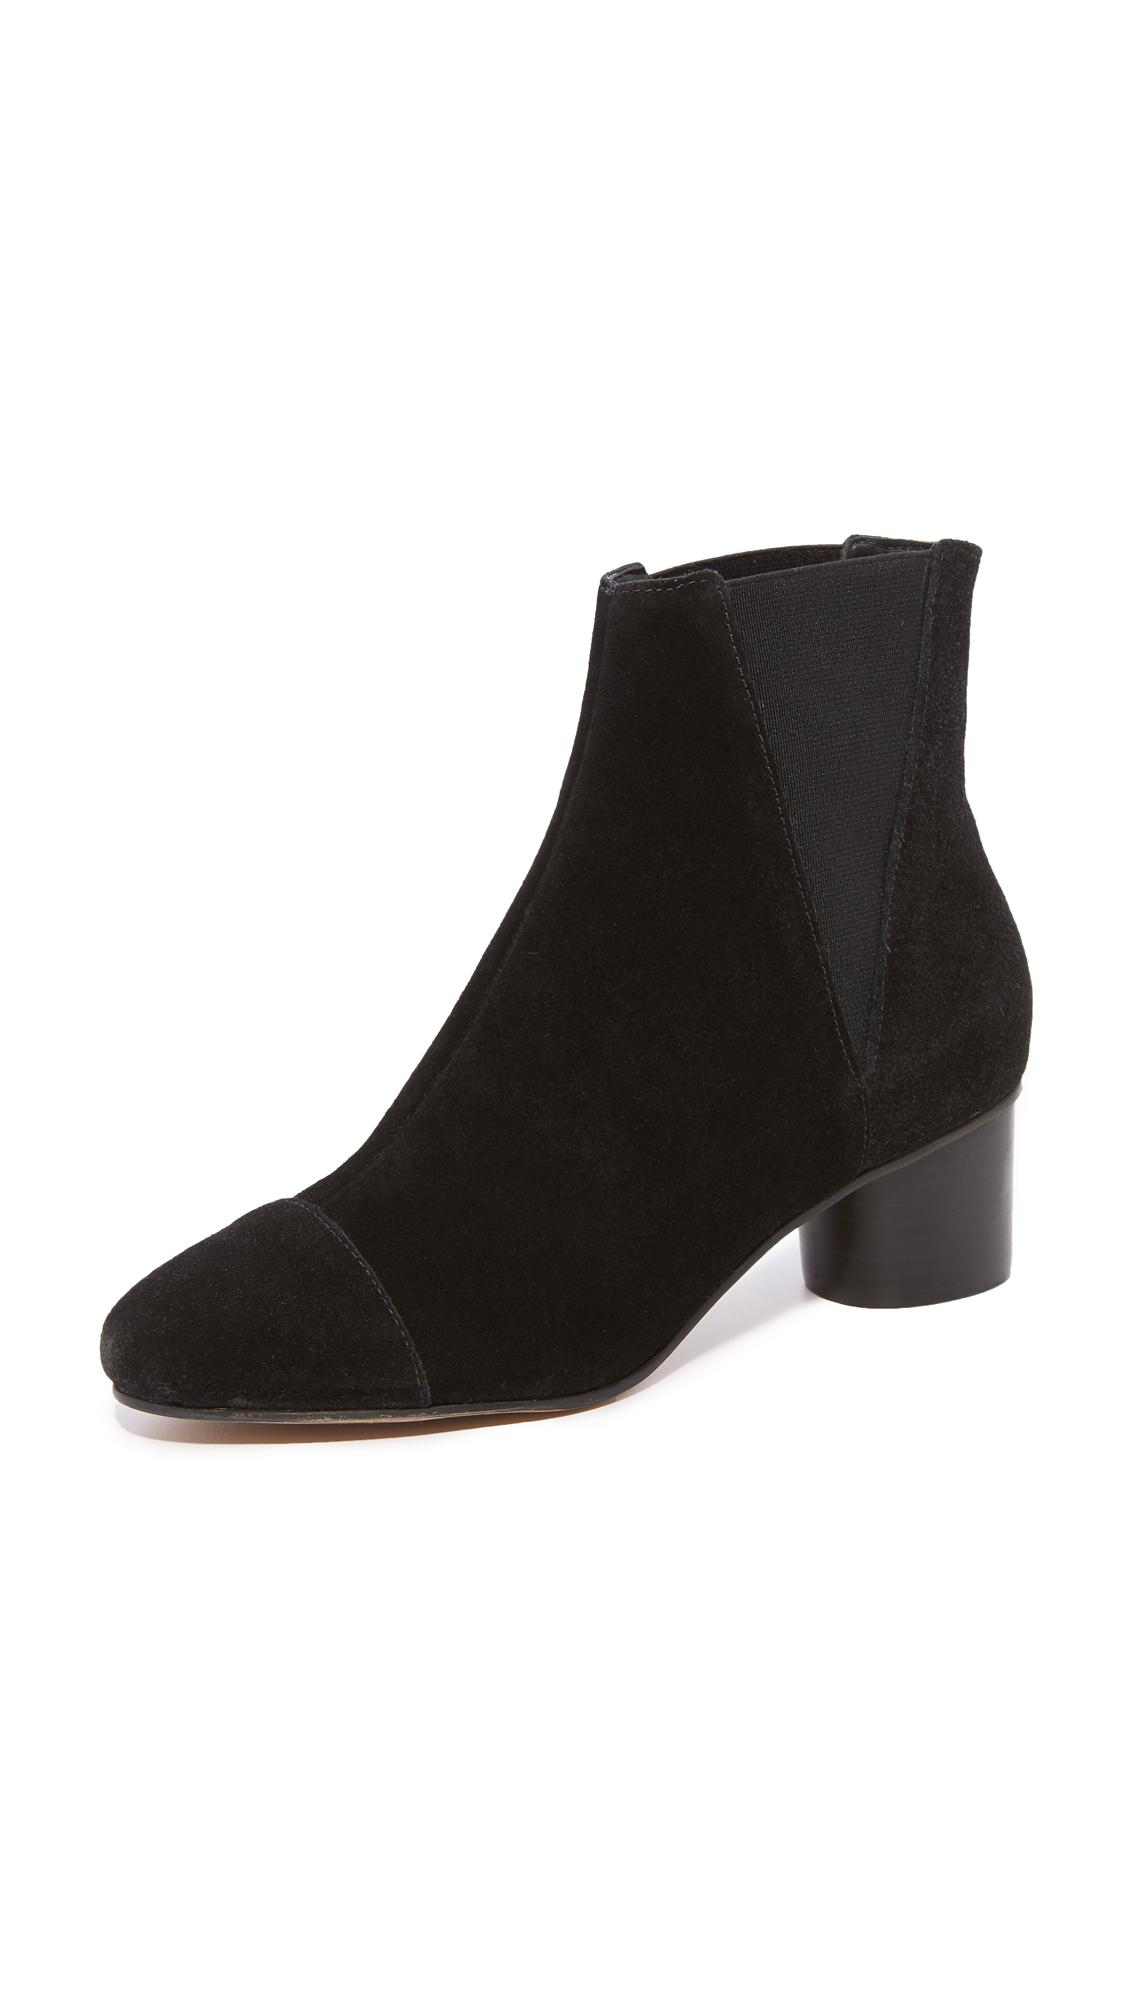 Rebecca Minkoff Izette Heeled Chelsea Boots - Black